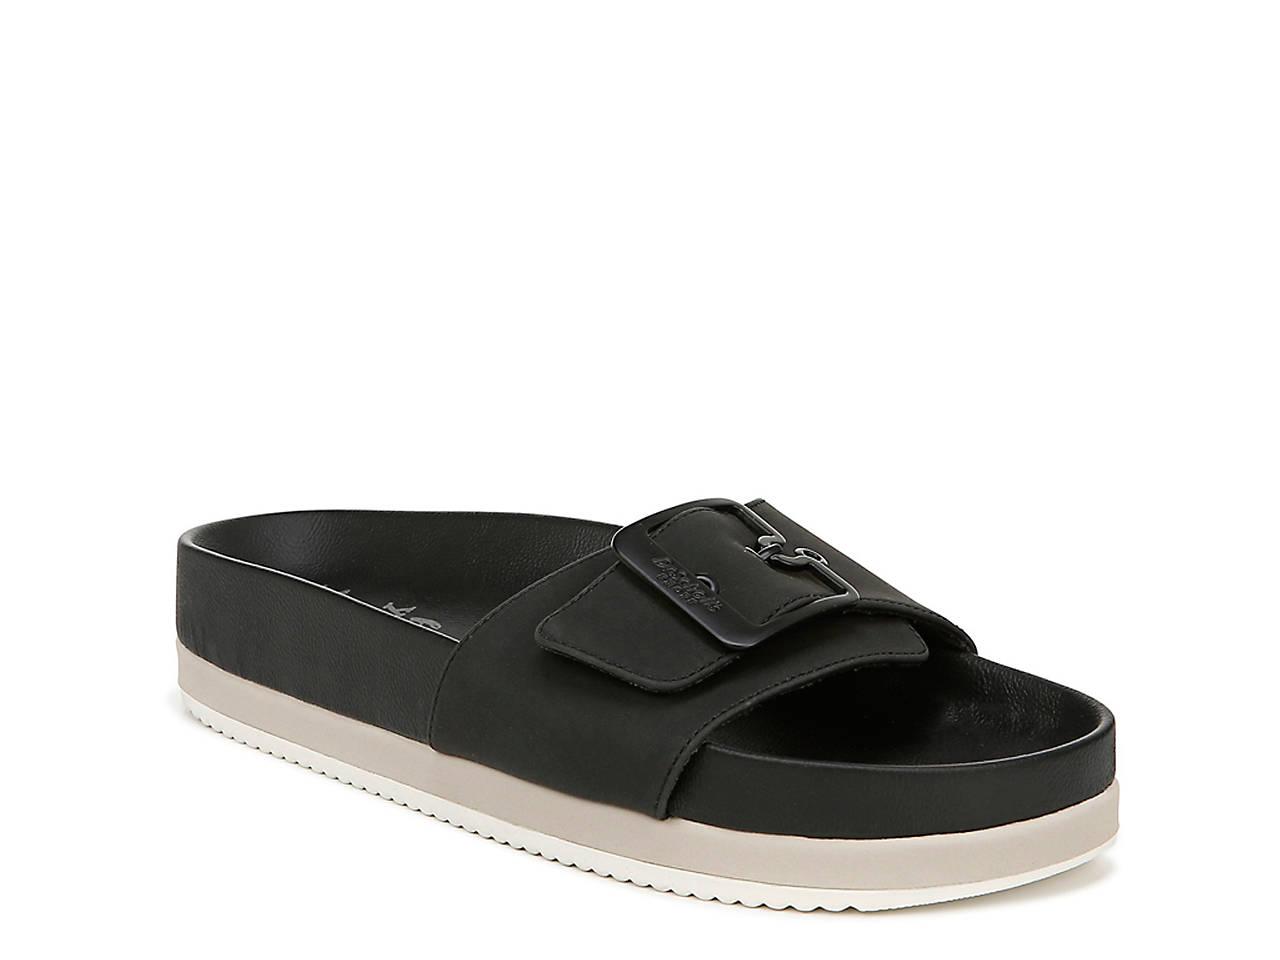 09baed1ae8ae Dr. Scholl s Laid Back Platform Sandal Women s Shoes